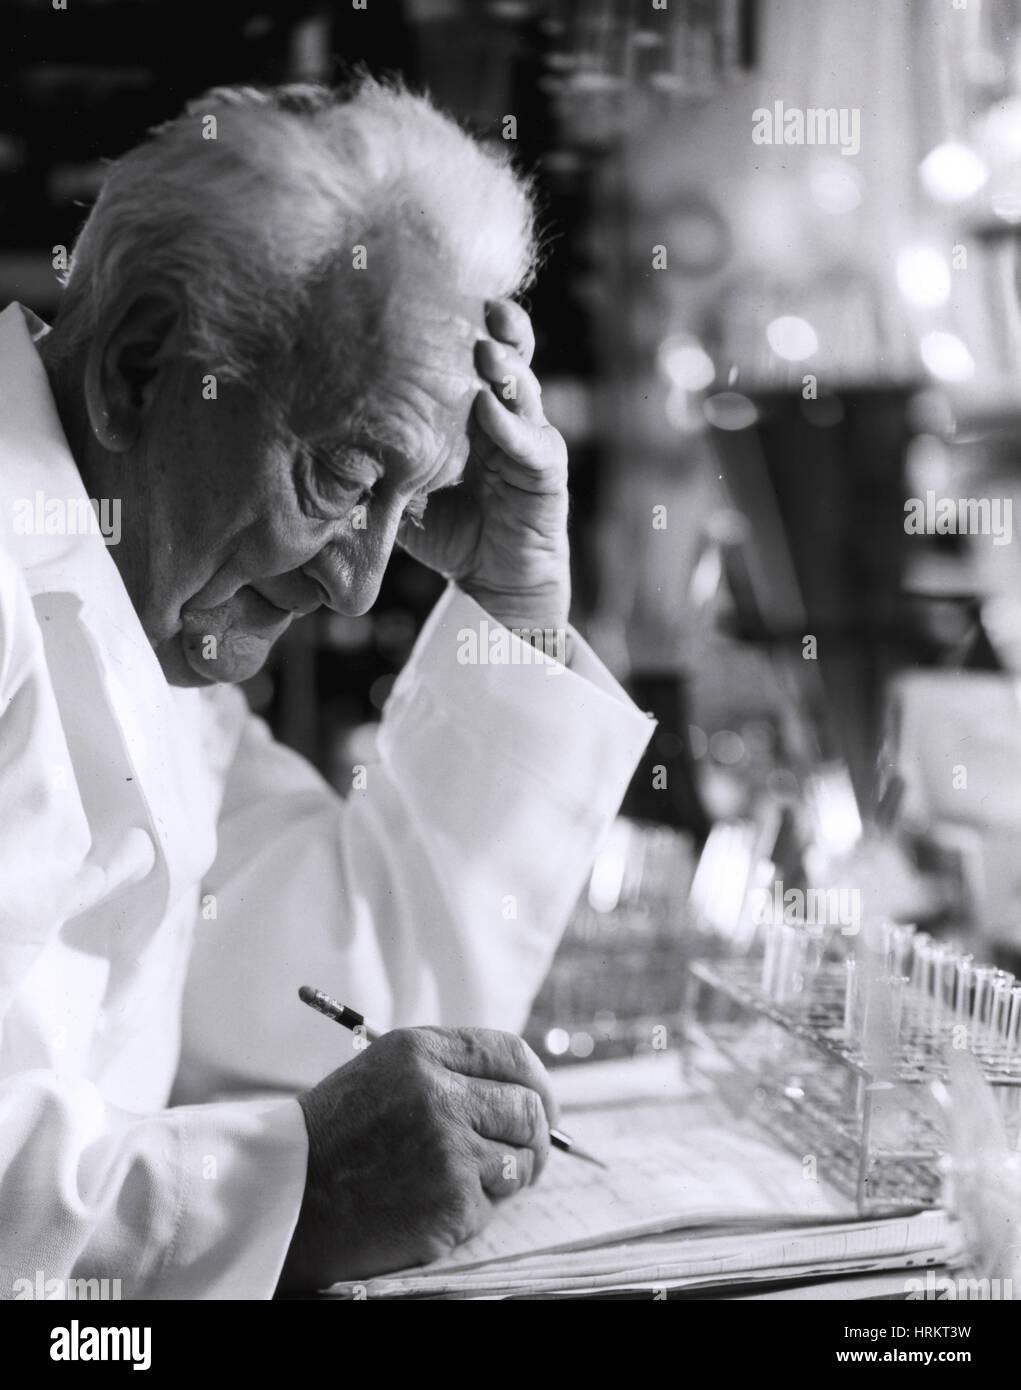 A. Szent-Gyorgyi, Hungarian-American Biochemist Stock Photo